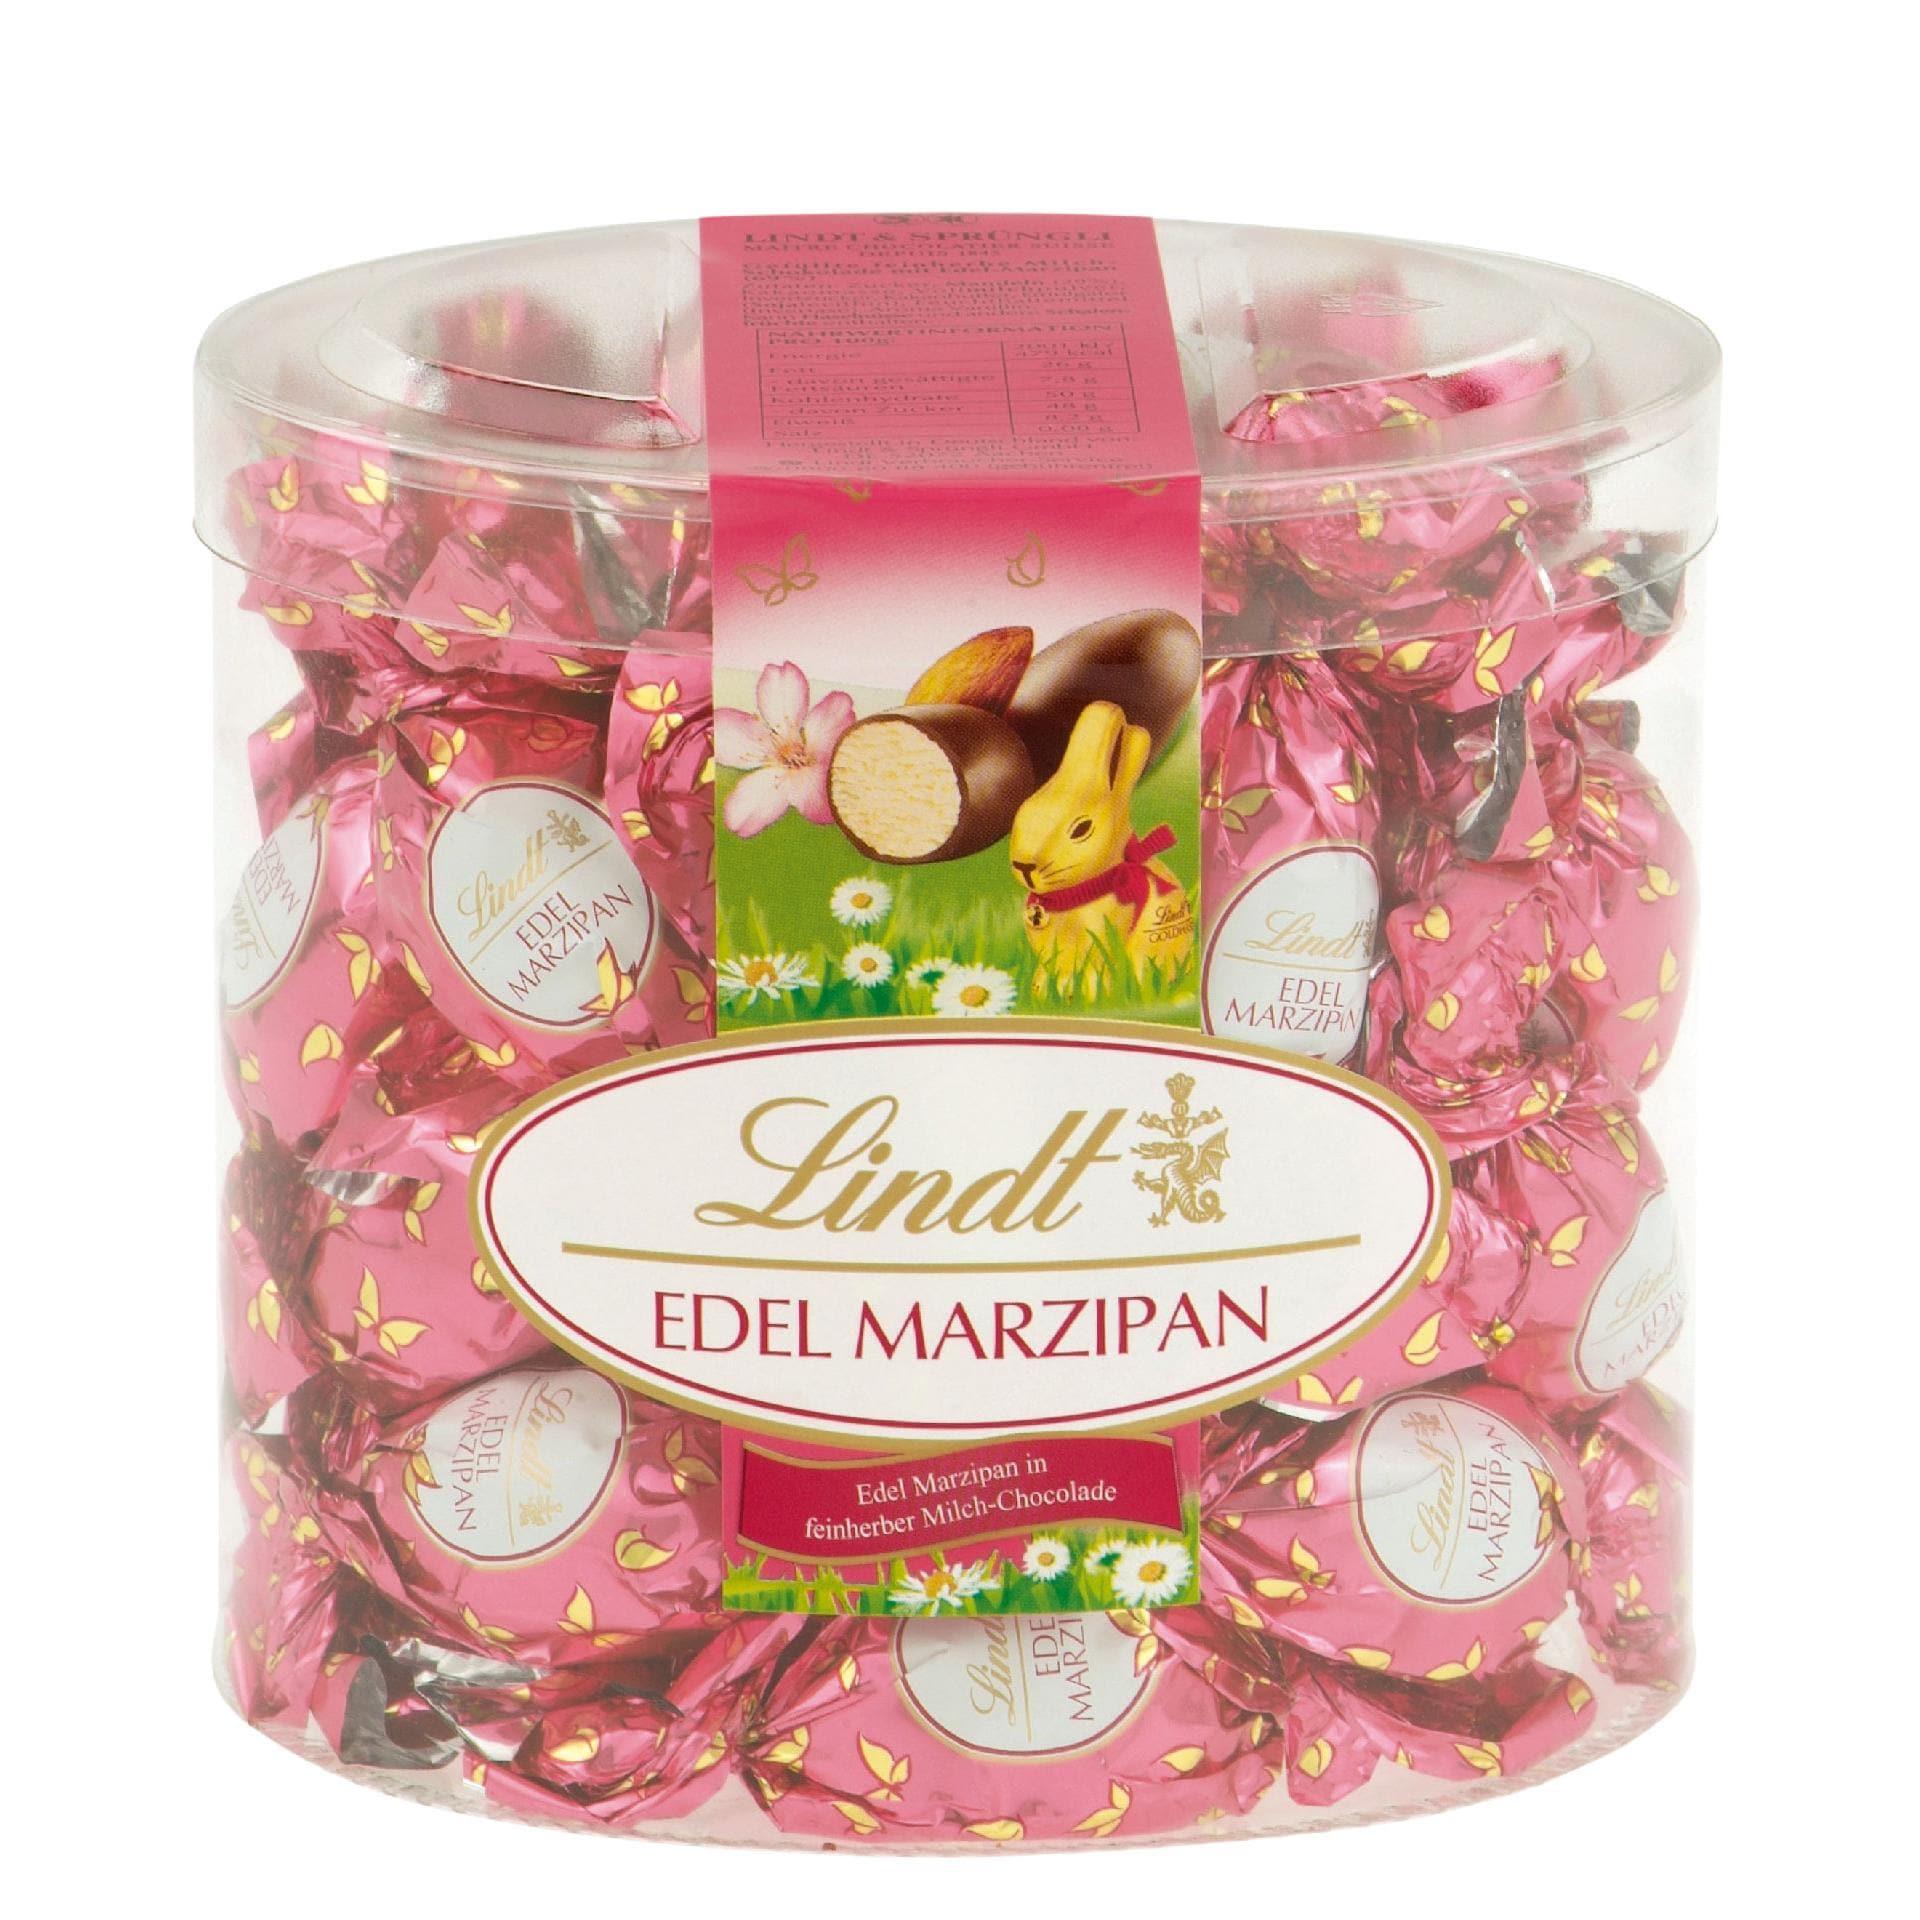 Lindt Edel Marzipan Milch-Schokoladen-Eier 425g, 25 Stück